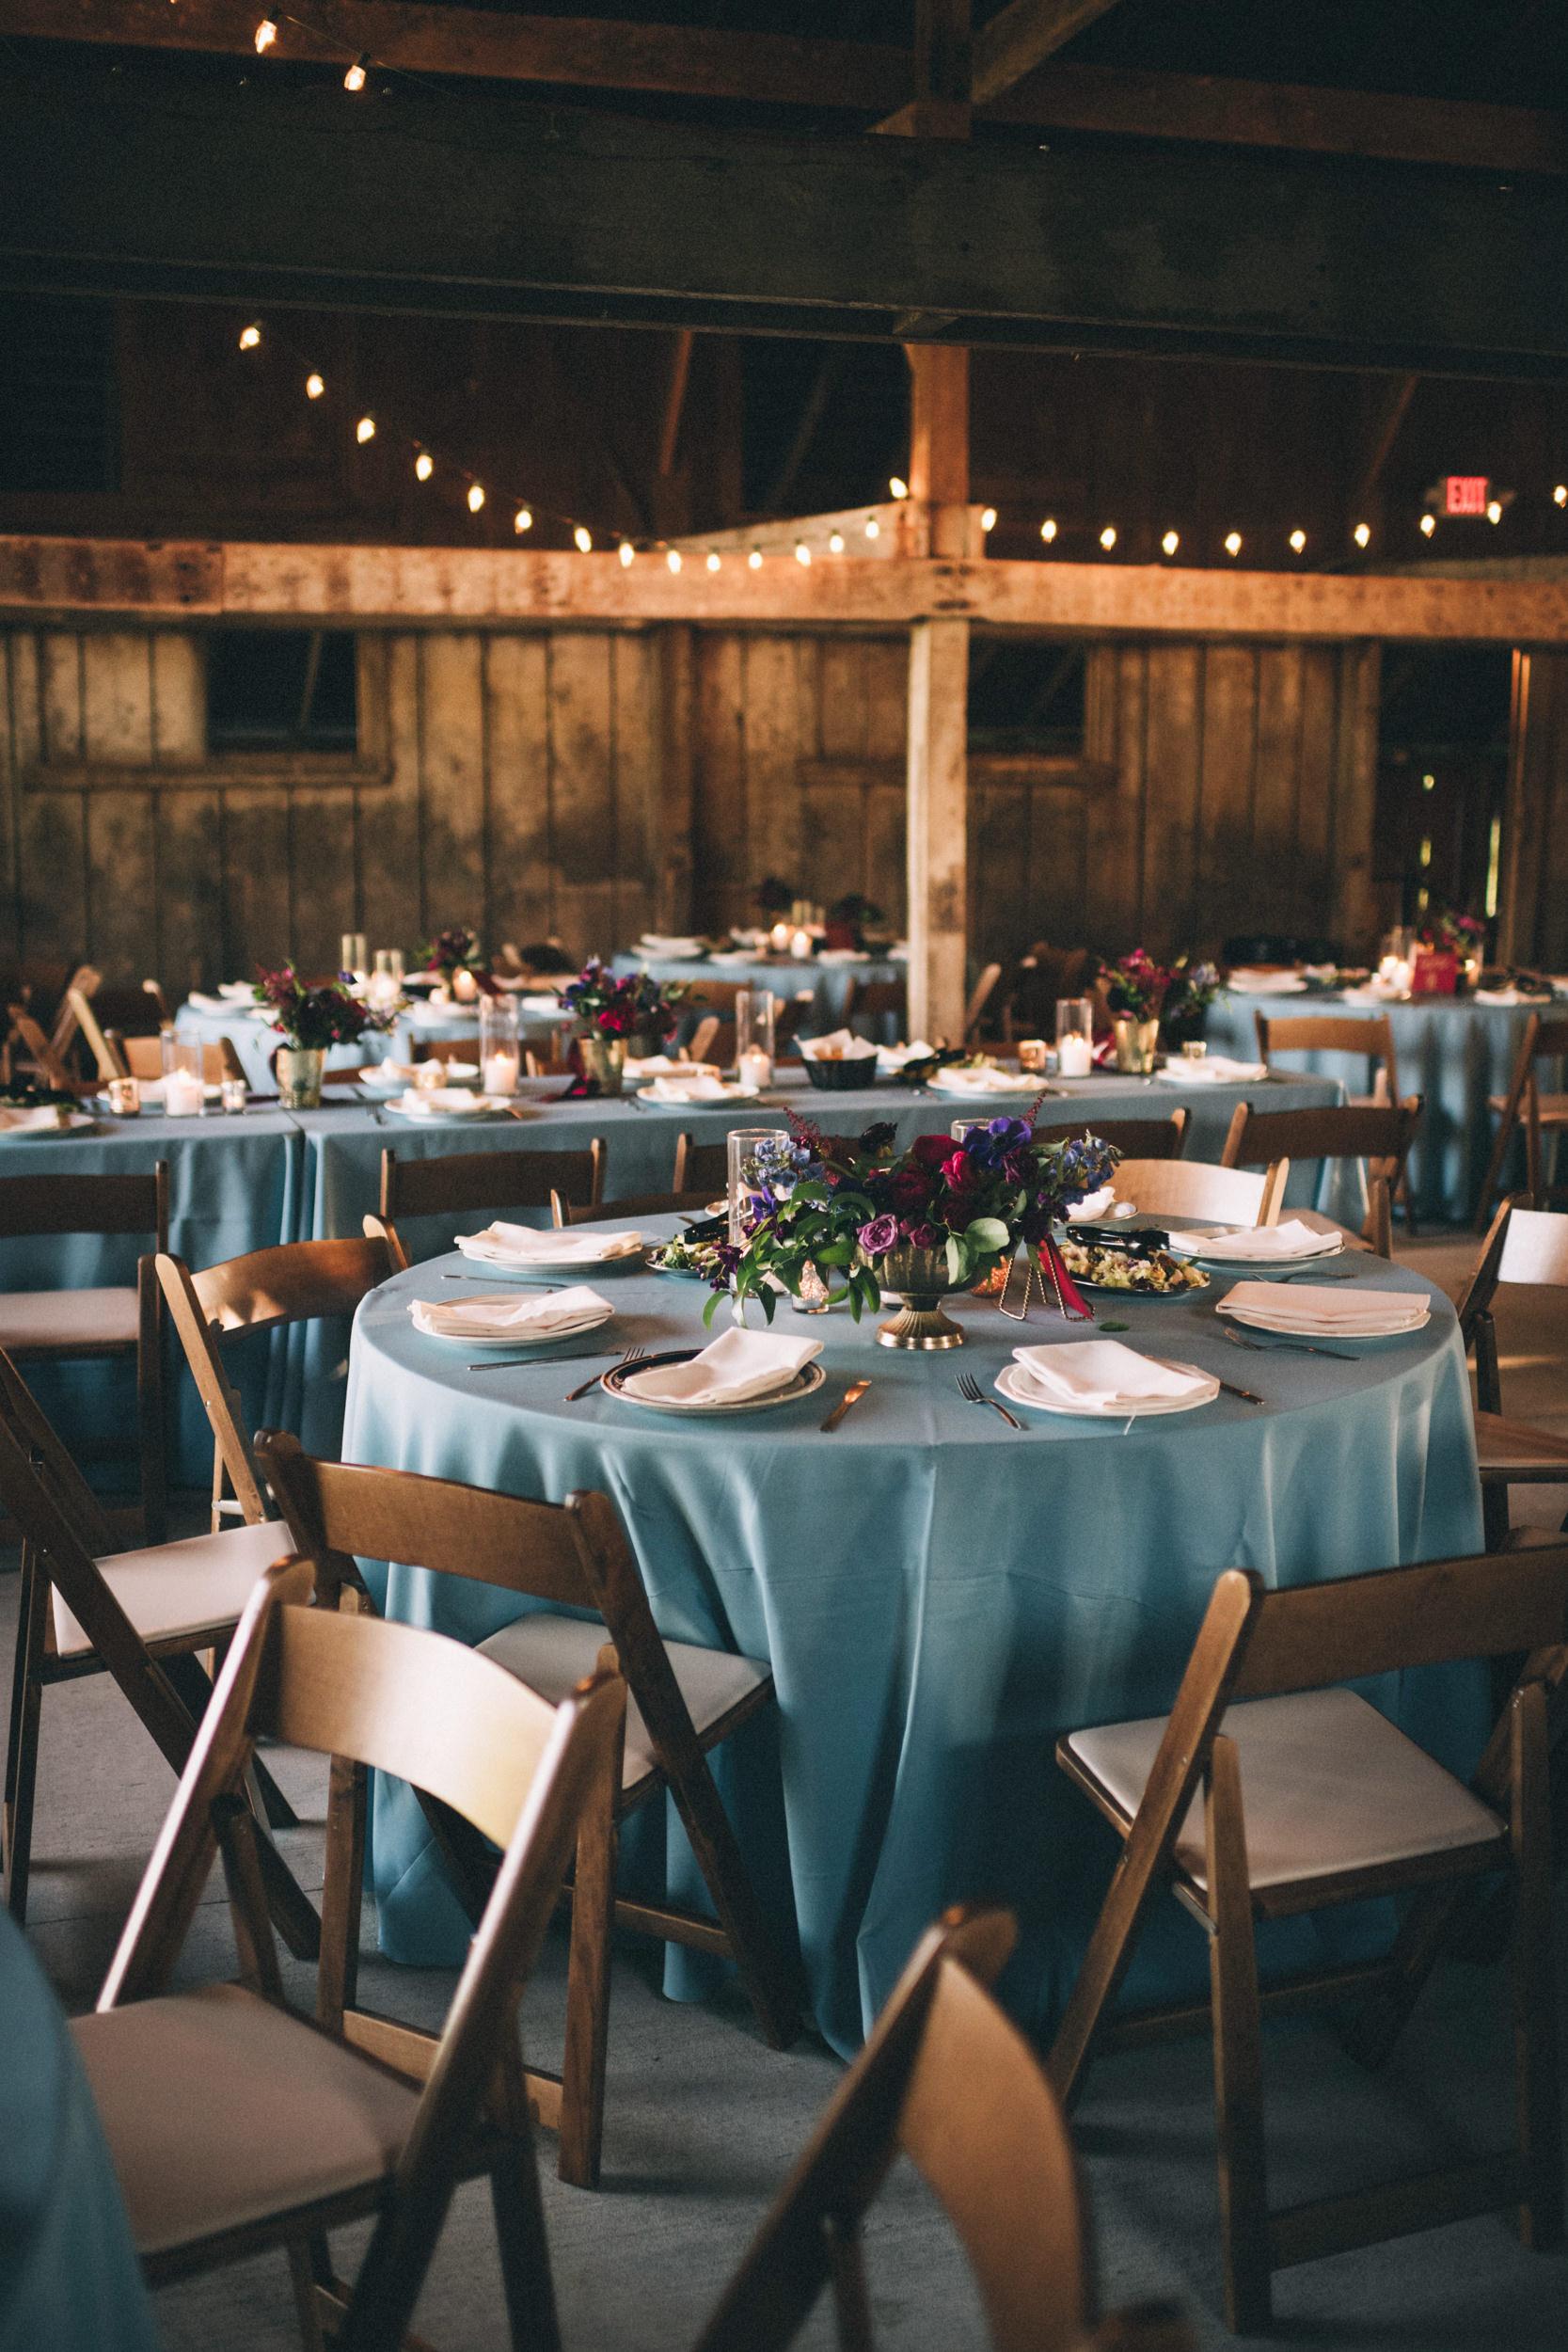 Louisville-Kentucky-Wedding-and-Elopement-Photographer-Sarah-Katherine-Davis-Photography-Summer-Jewel-Toned-Wedding-Chineese-Tea-Ceremony-Warrenwood-Manor-Danville-693.jpg